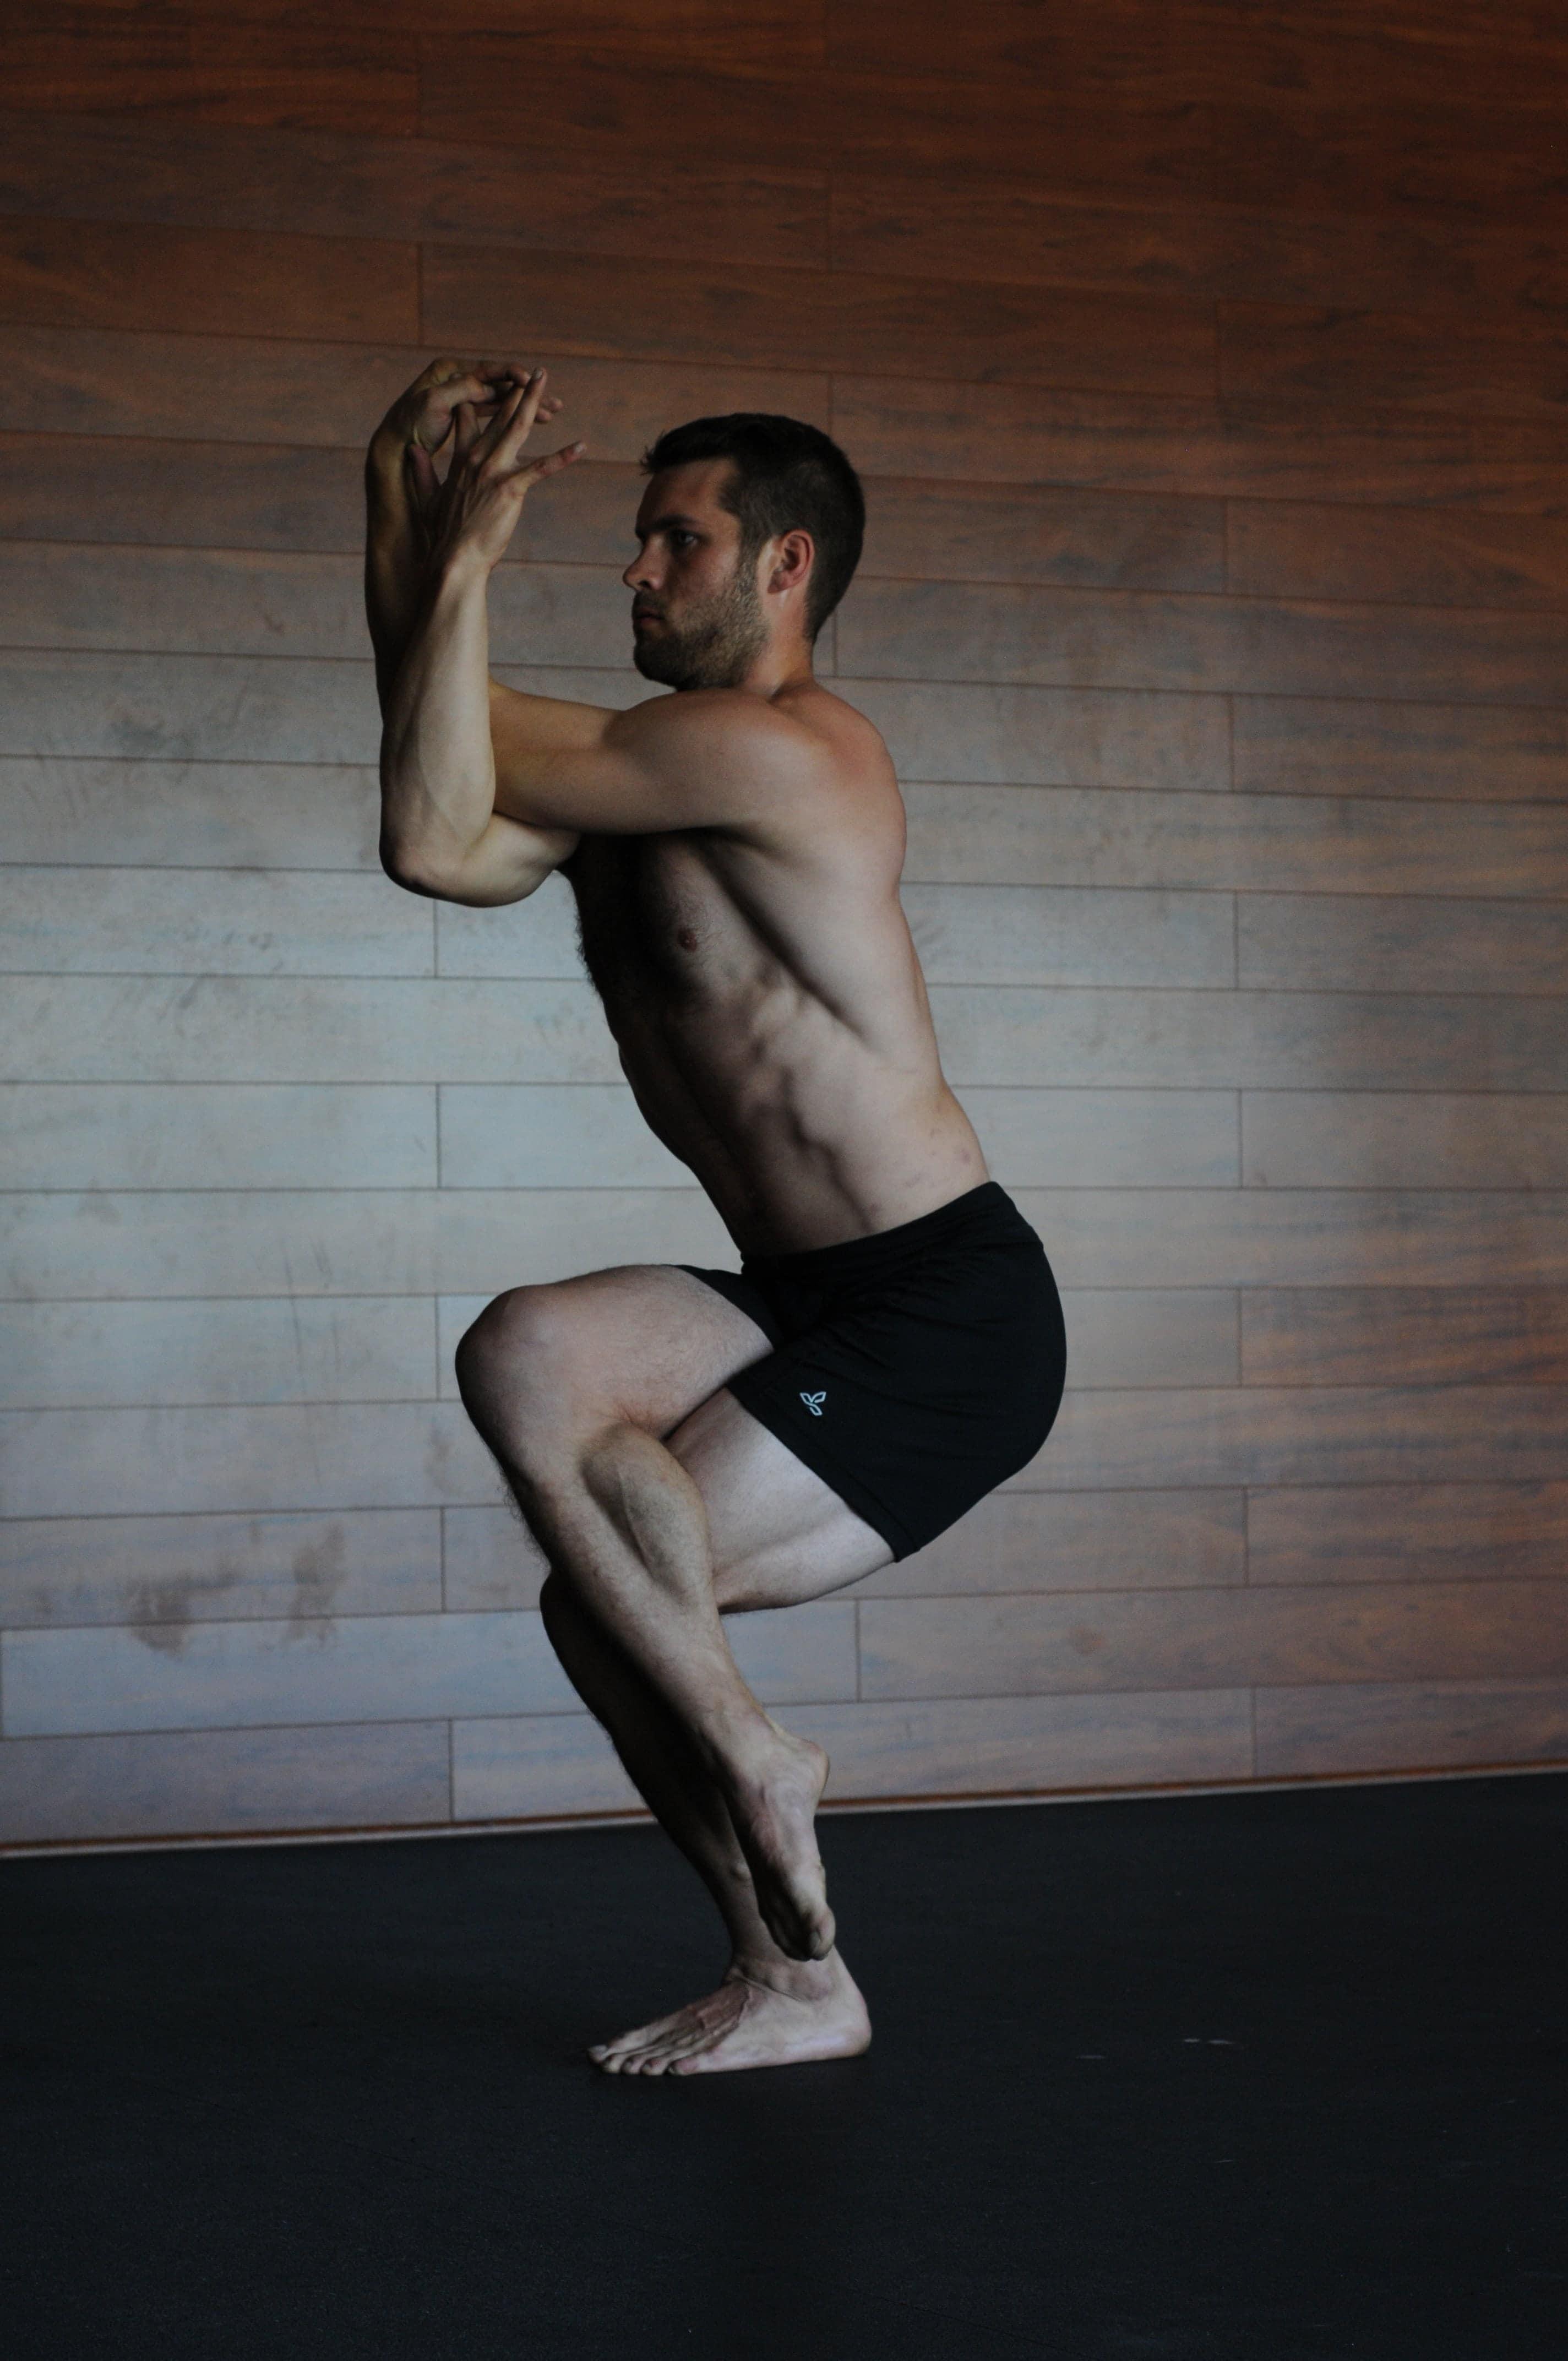 Guy yoga Nude Photos 54